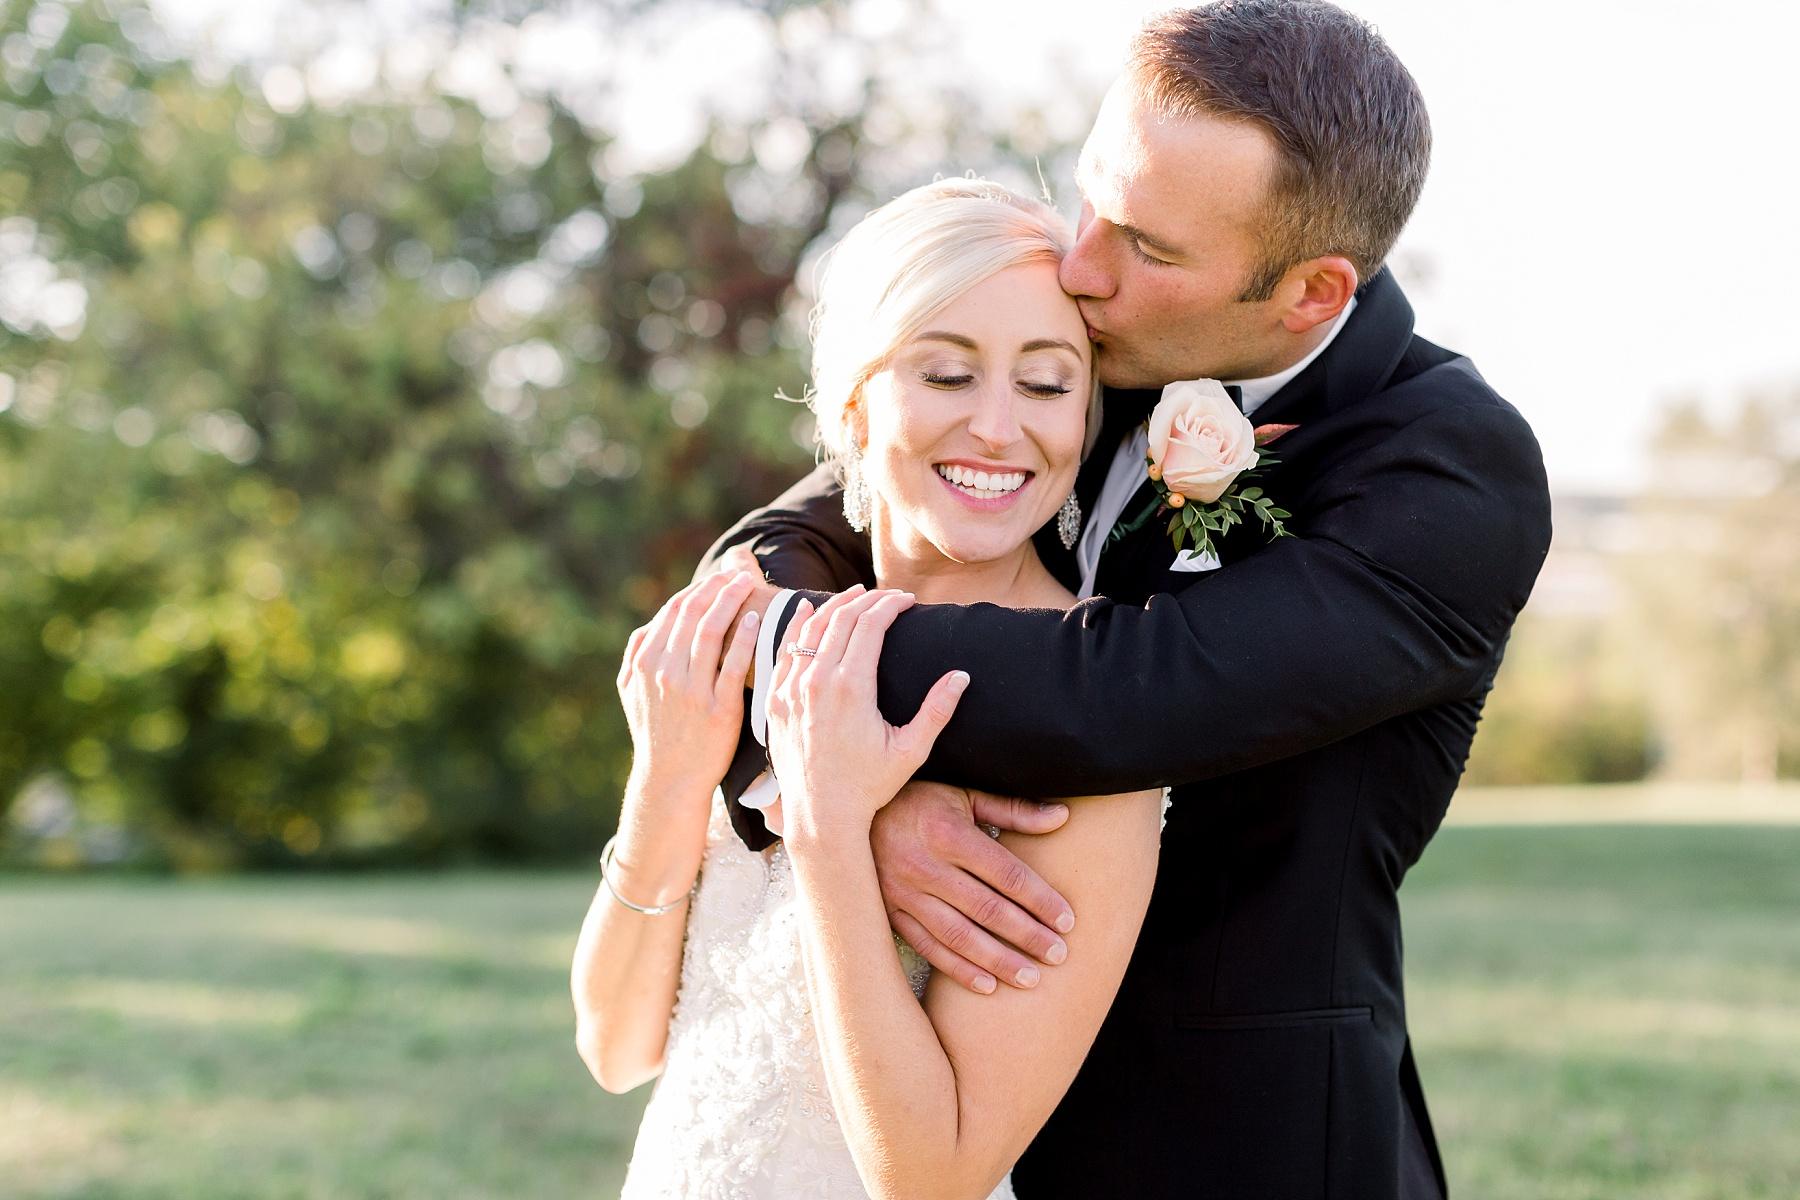 midwest-adventurous-wedding-photographer-elizabeth-ladean-photography-photo_4802.jpg